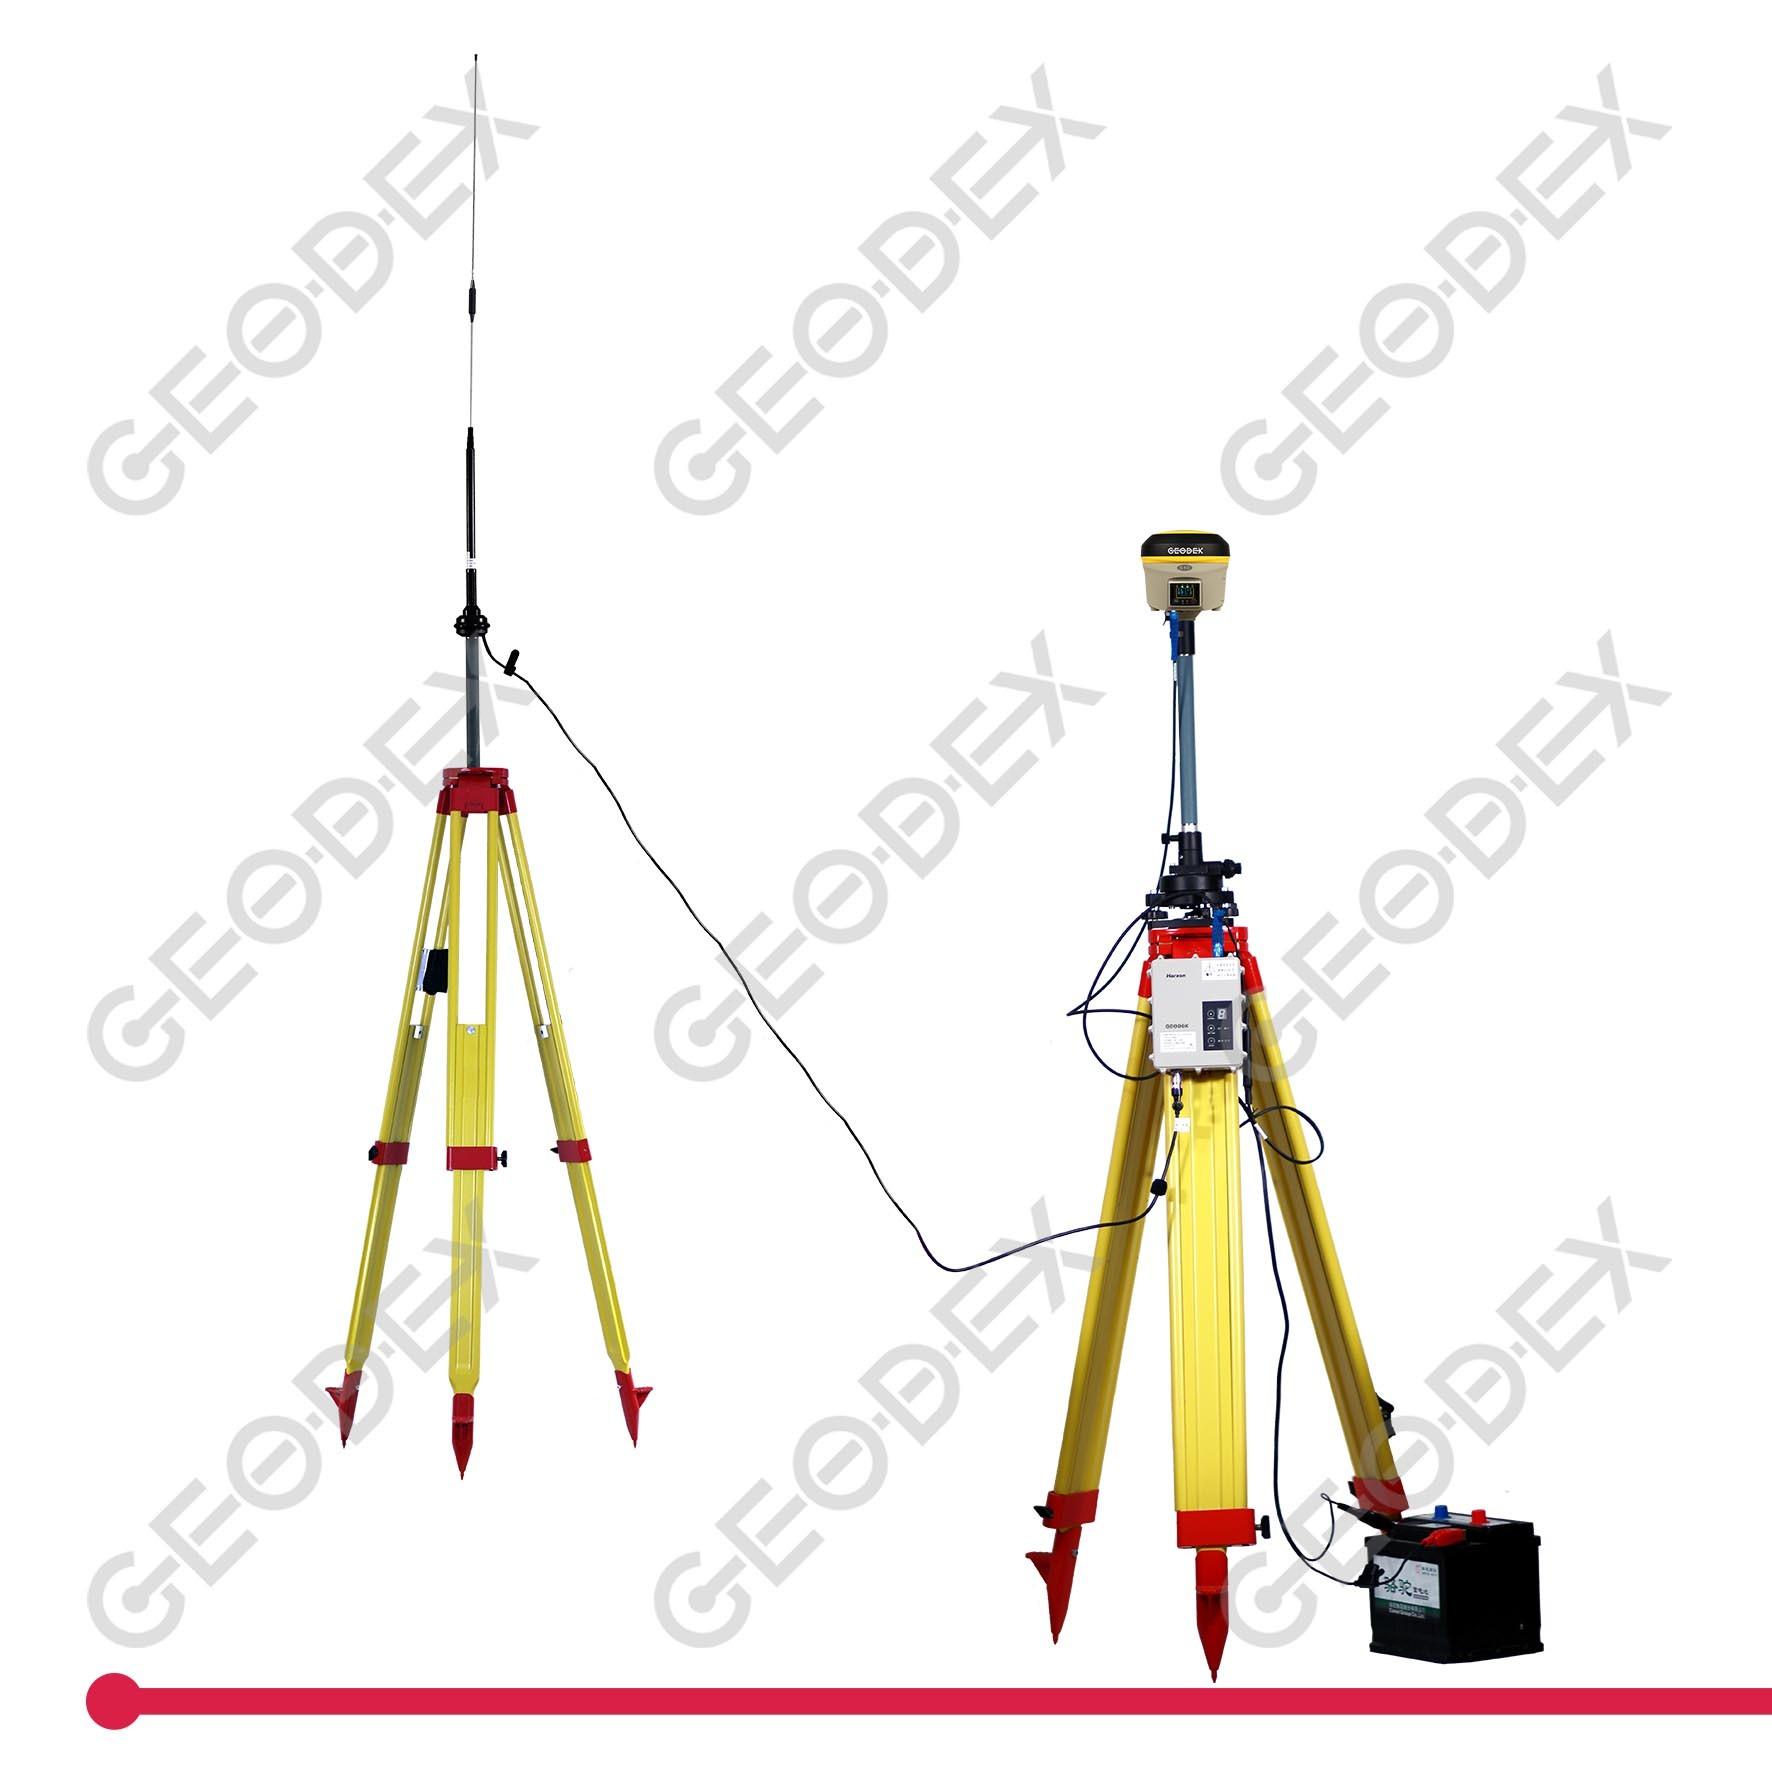 [Hot Item] Rtk GPS Base Station with External Radio for Topographic  Surveying